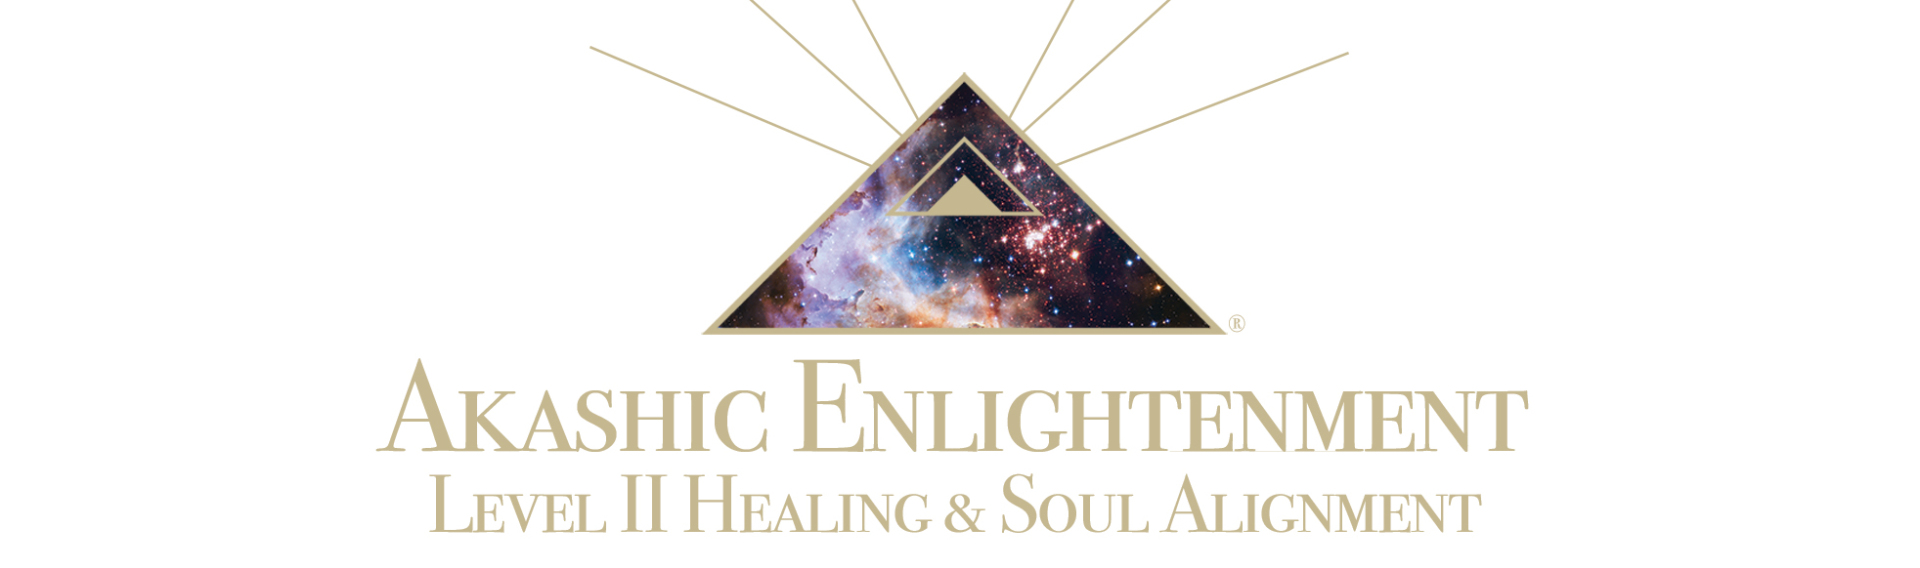 Sherry Mosley, MSOM, Asian Medicine, Acupuncture, Herbal Medicine, Shamanic Healing, Shamanism, Akashic Records, Psychic Readings, Energy Healing, Reiki